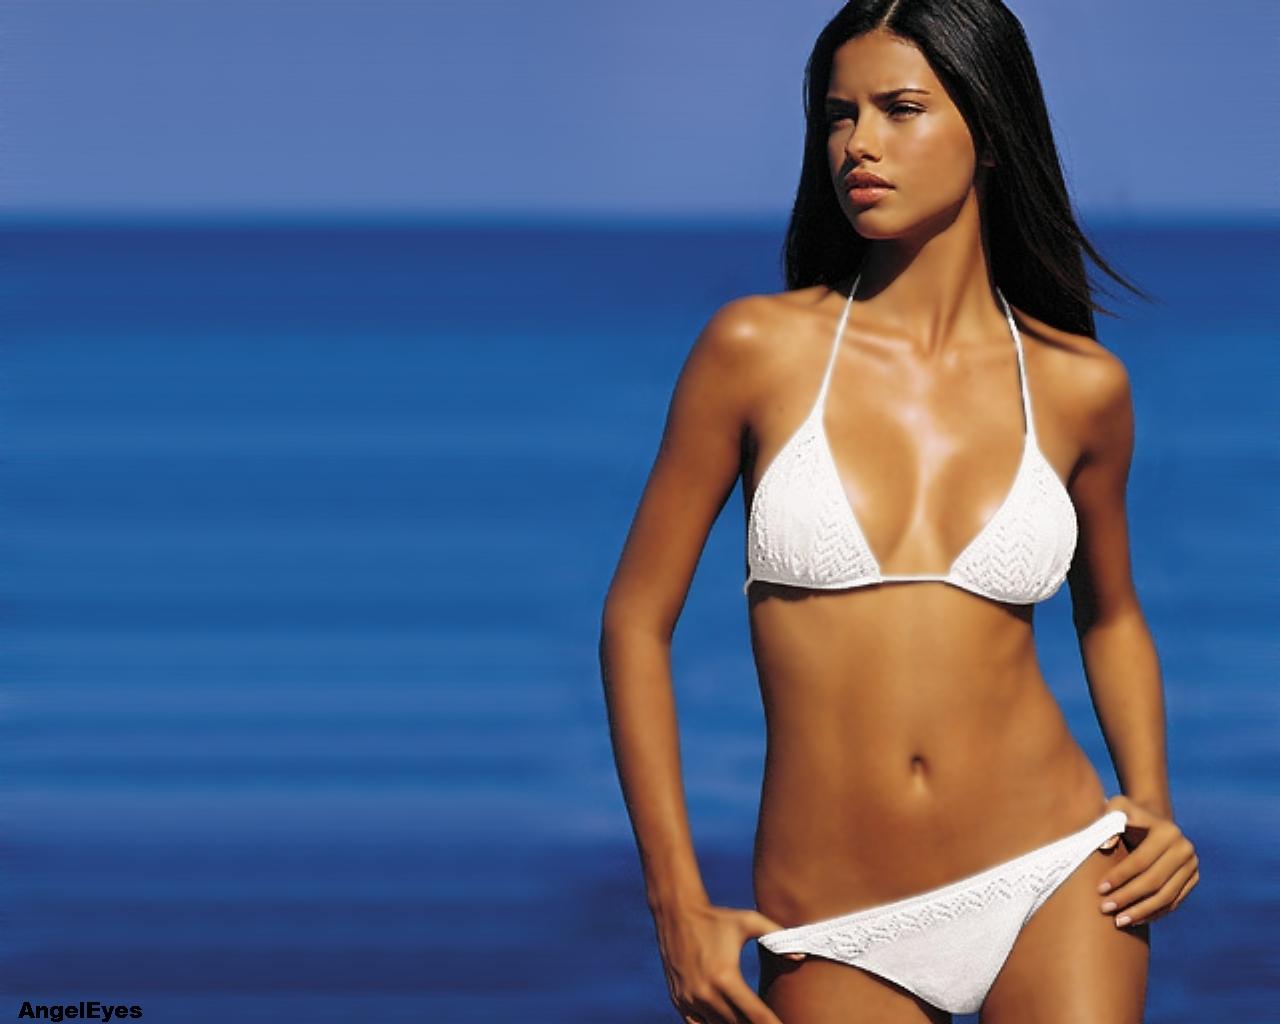 Hot Bikini Girls pictures